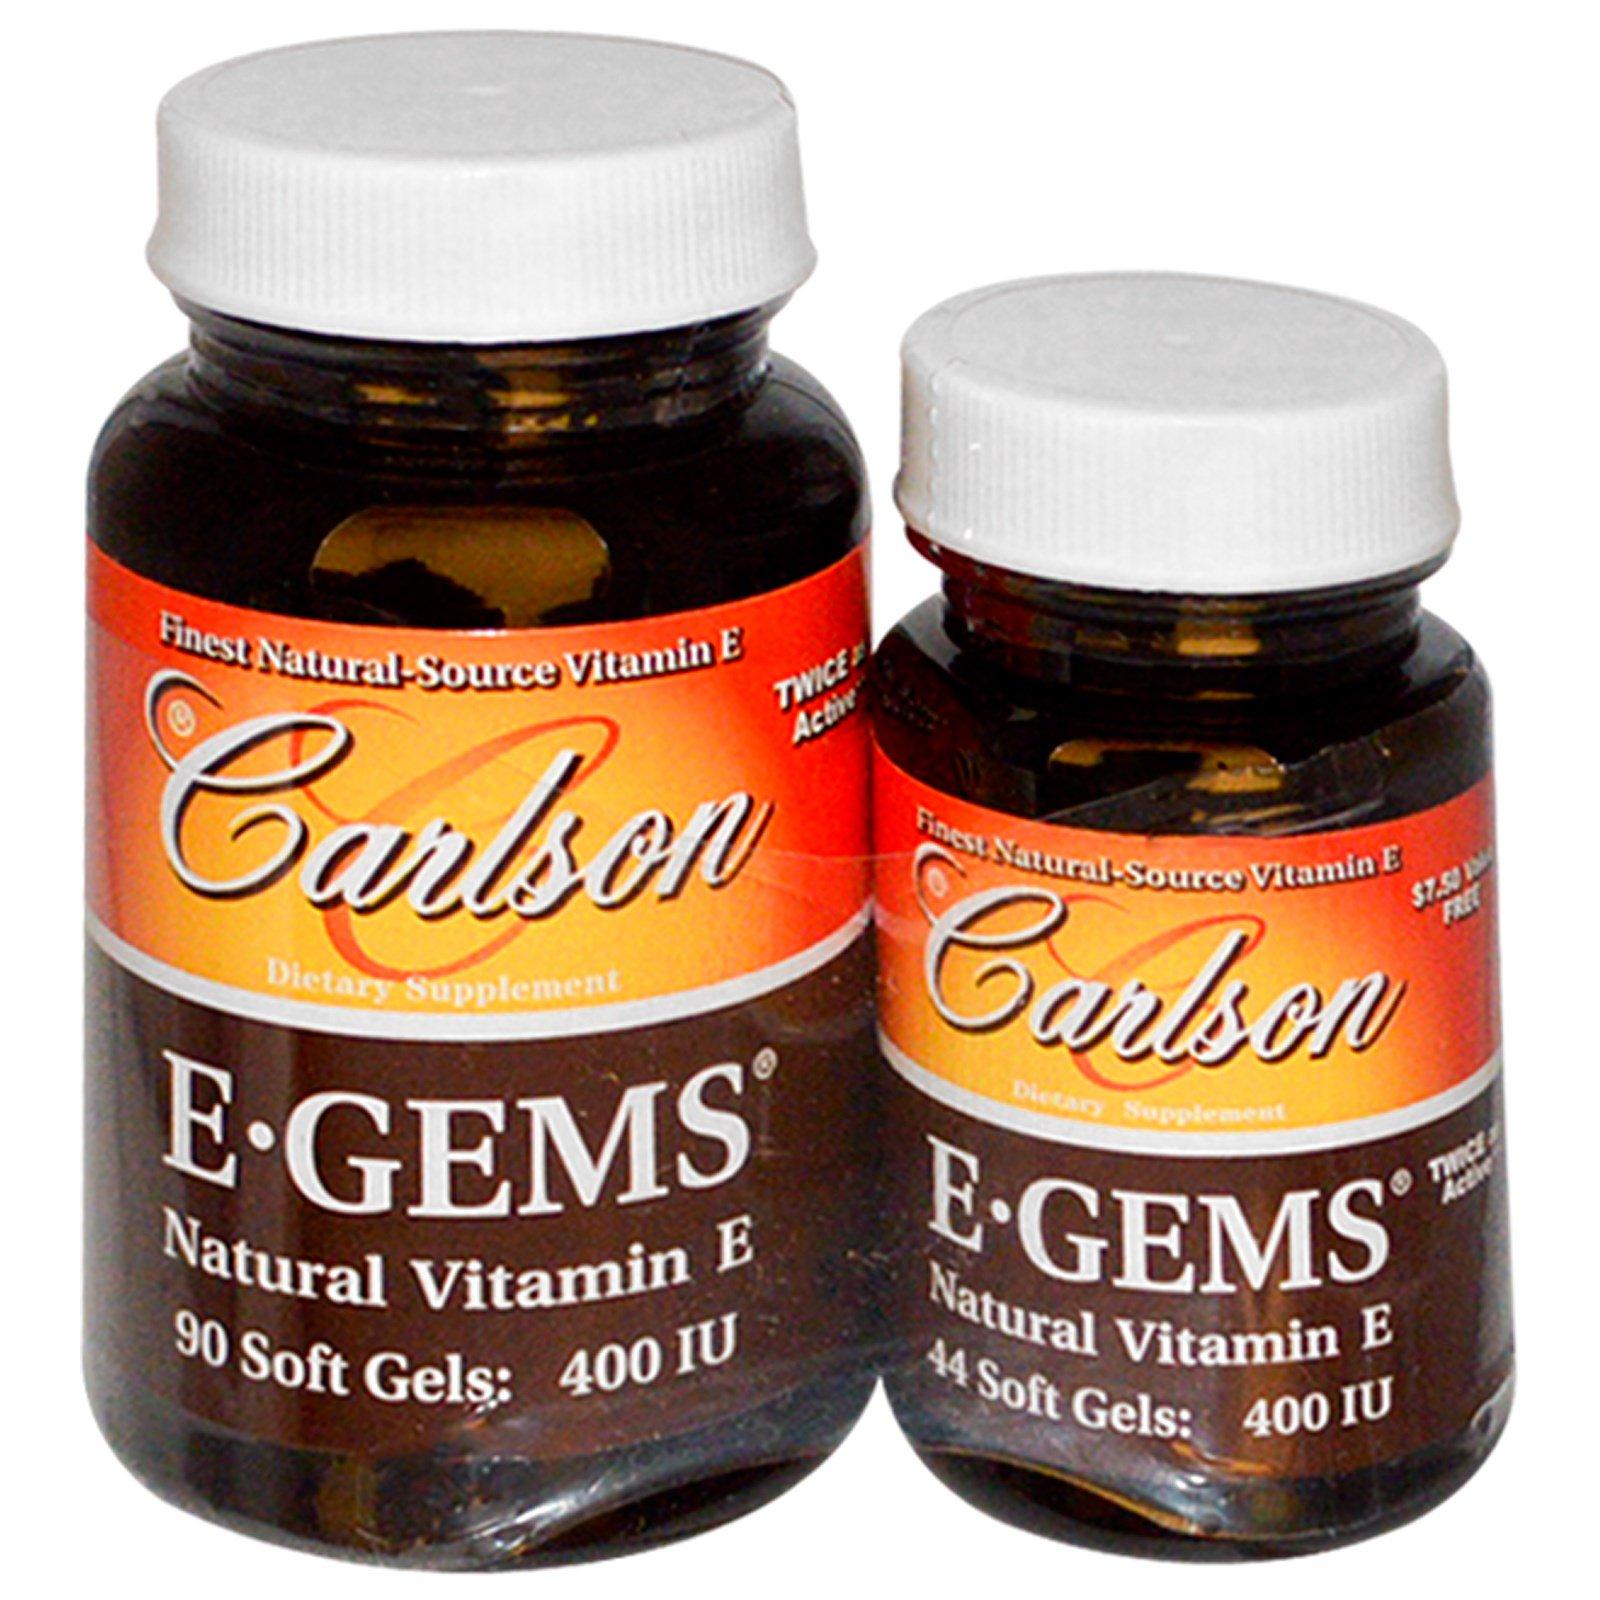 Carlson Labs, E-Gems, натуральный витамин E, 400 МЕ, 2 флакона, 90 желатиновых капсул + 44 желатиновые капсулы